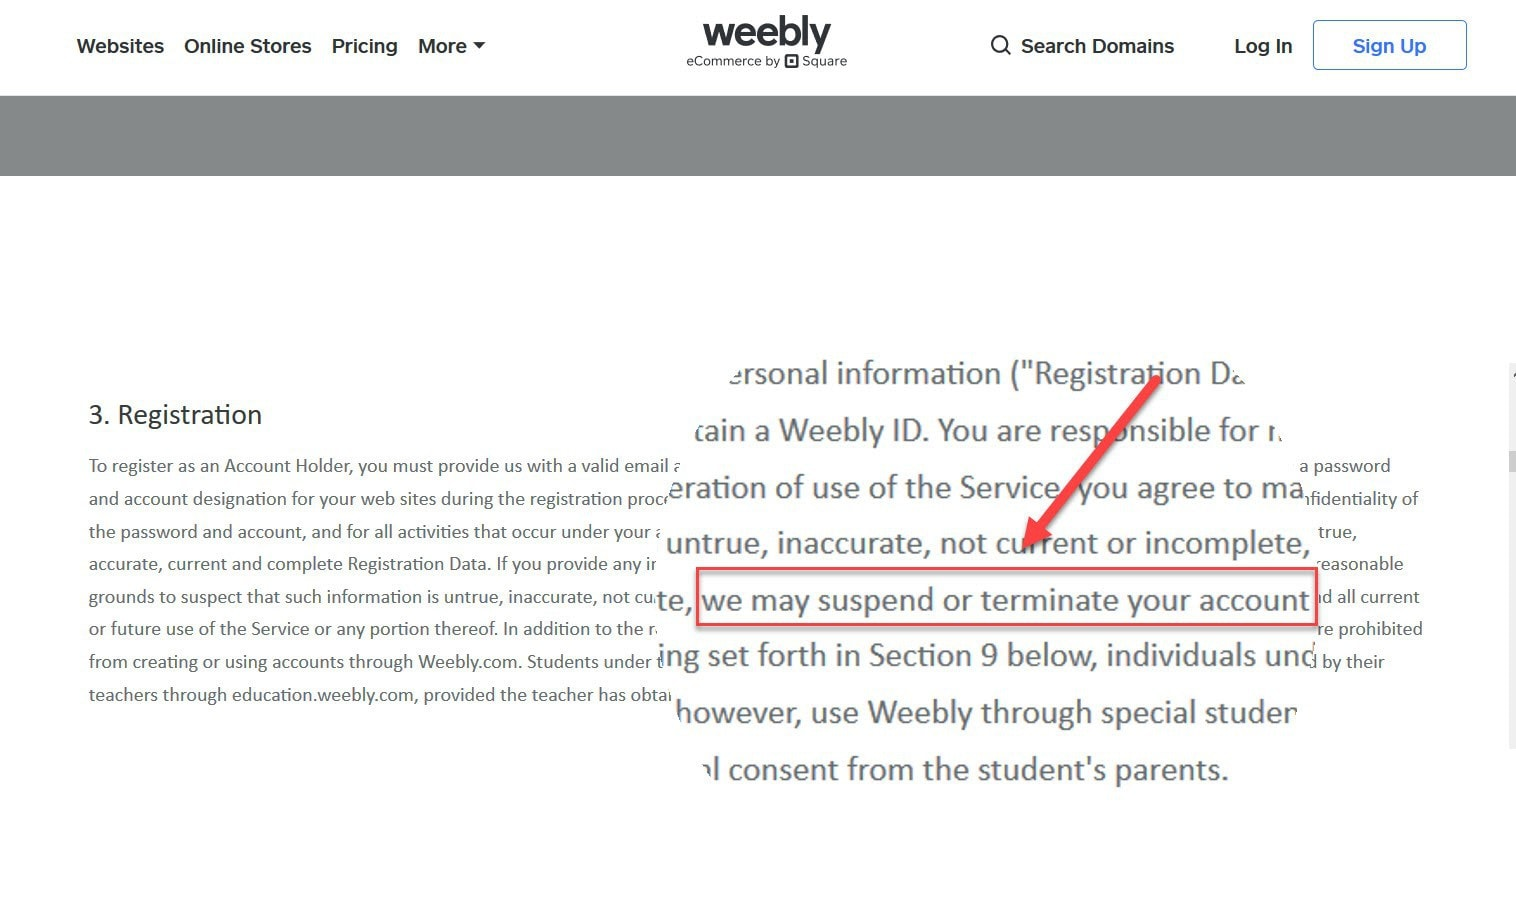 Weebly registration information